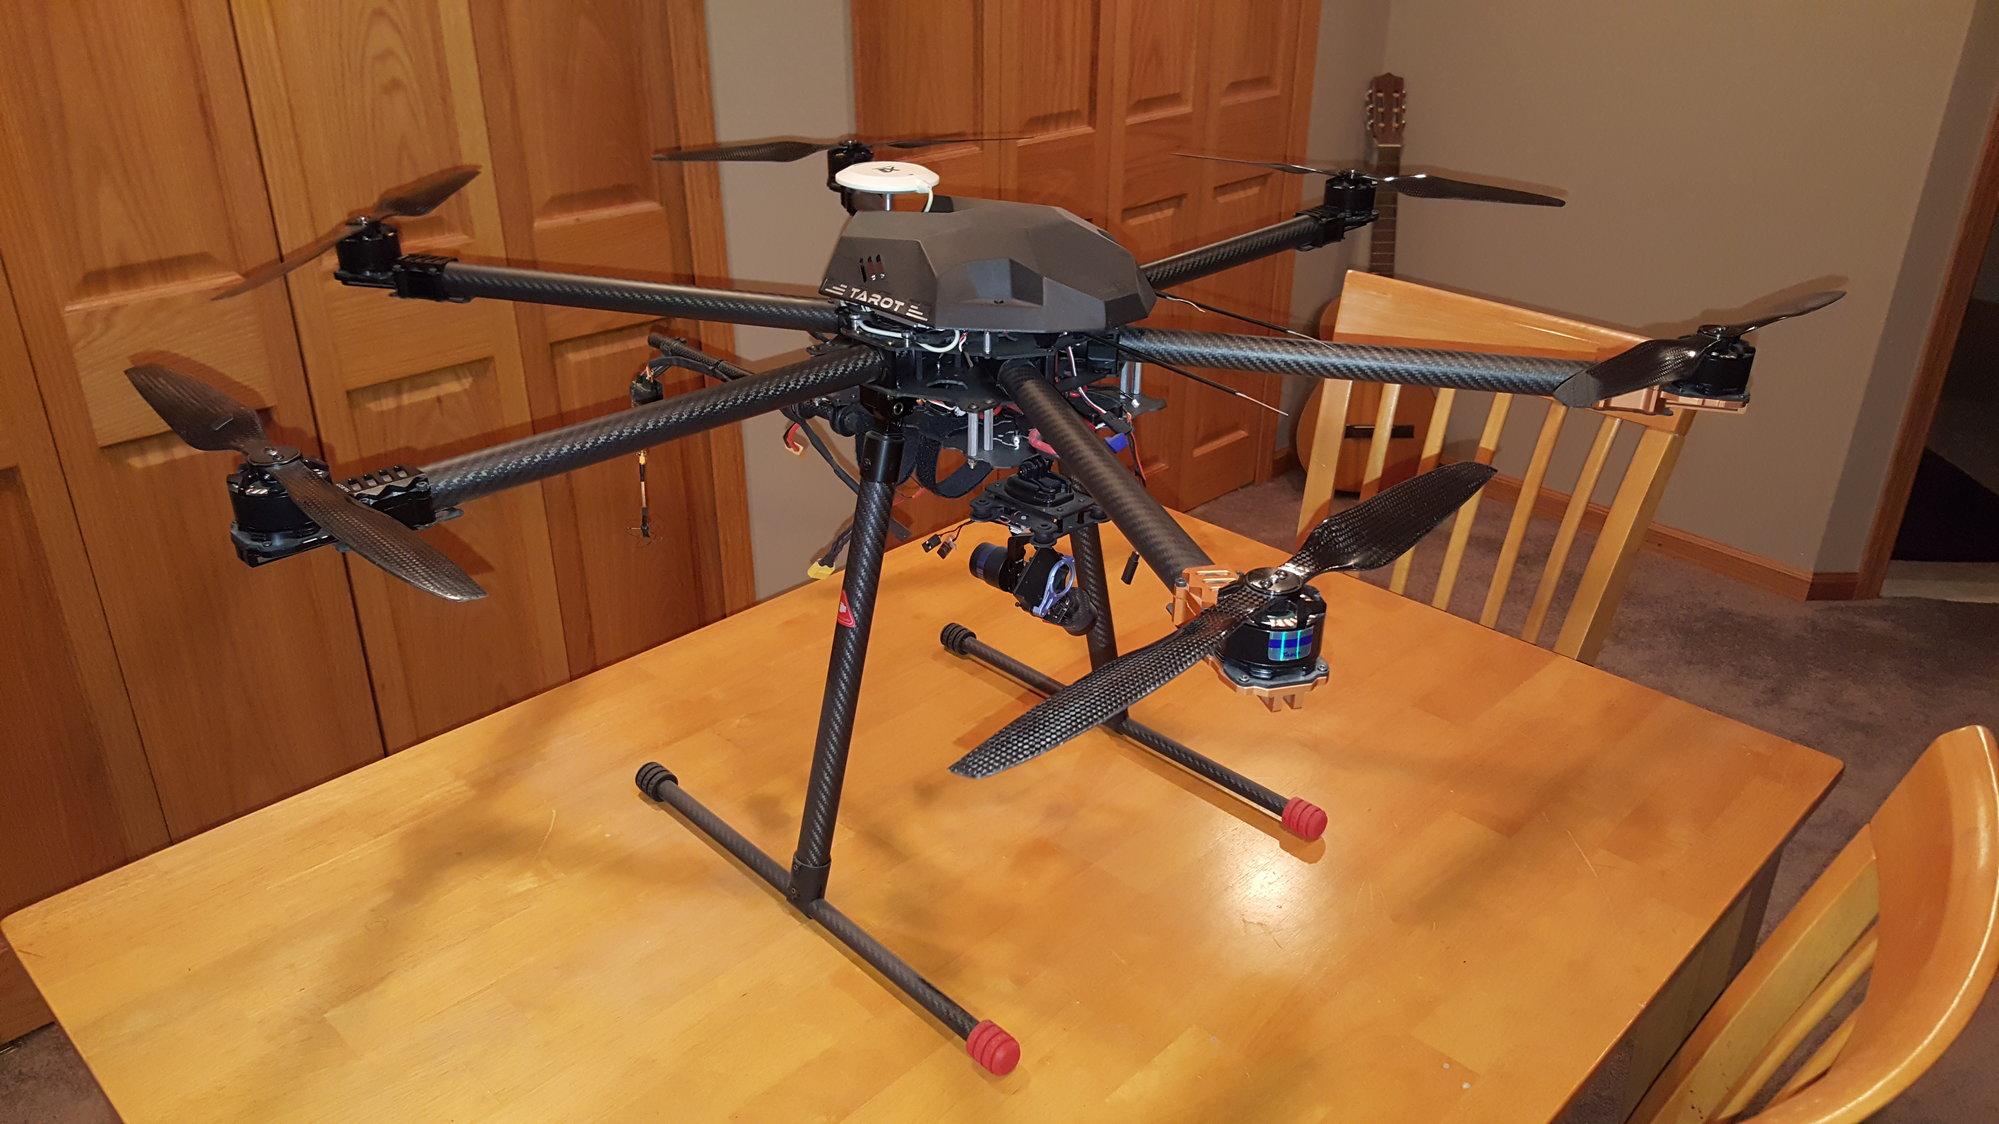 Tarot T960 Carbon Fiber Hexacopter - RCU Forums